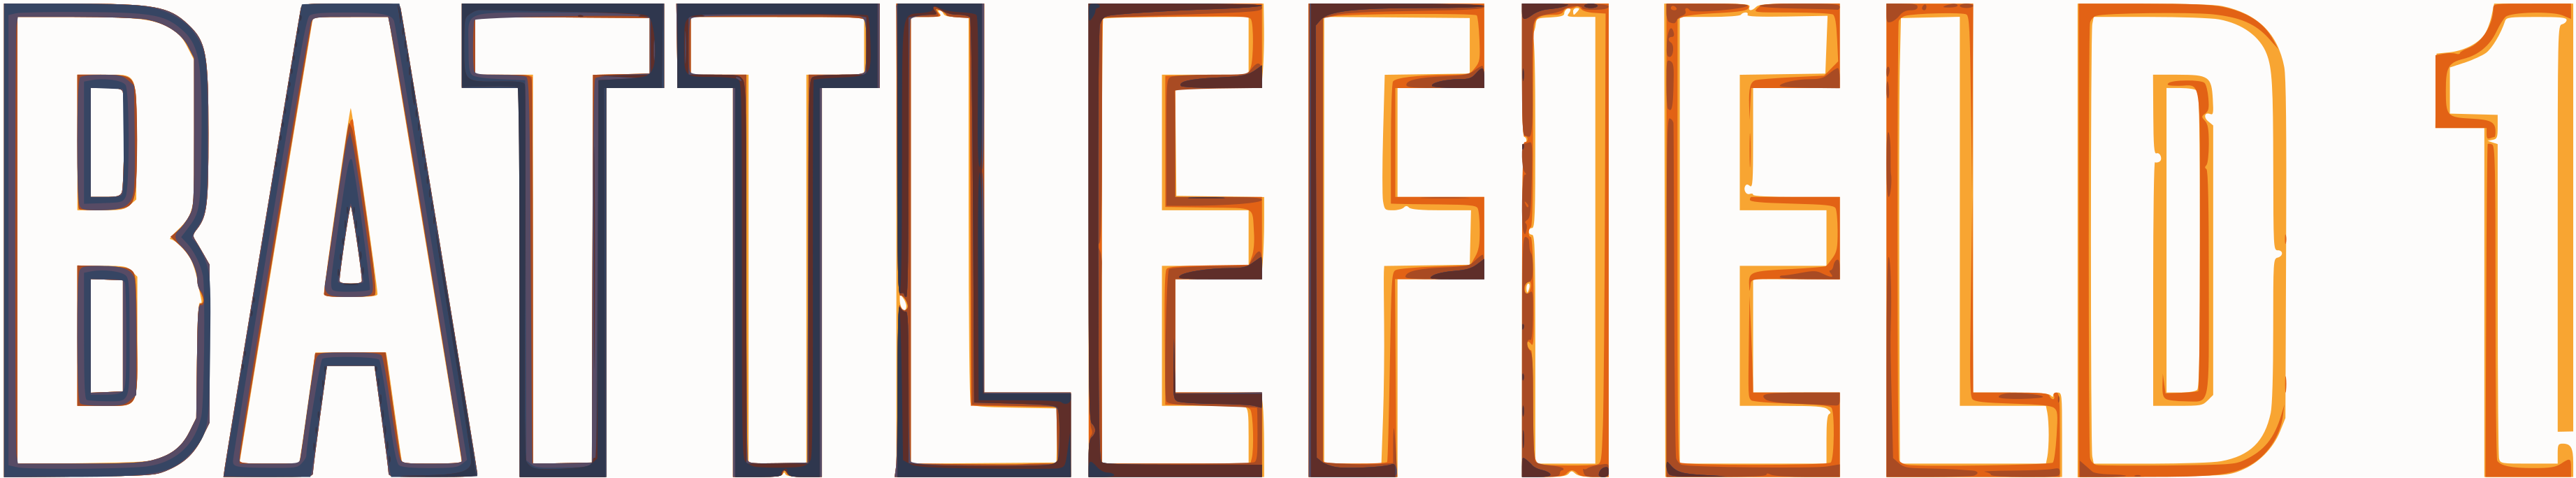 Battlefield-1-Logo